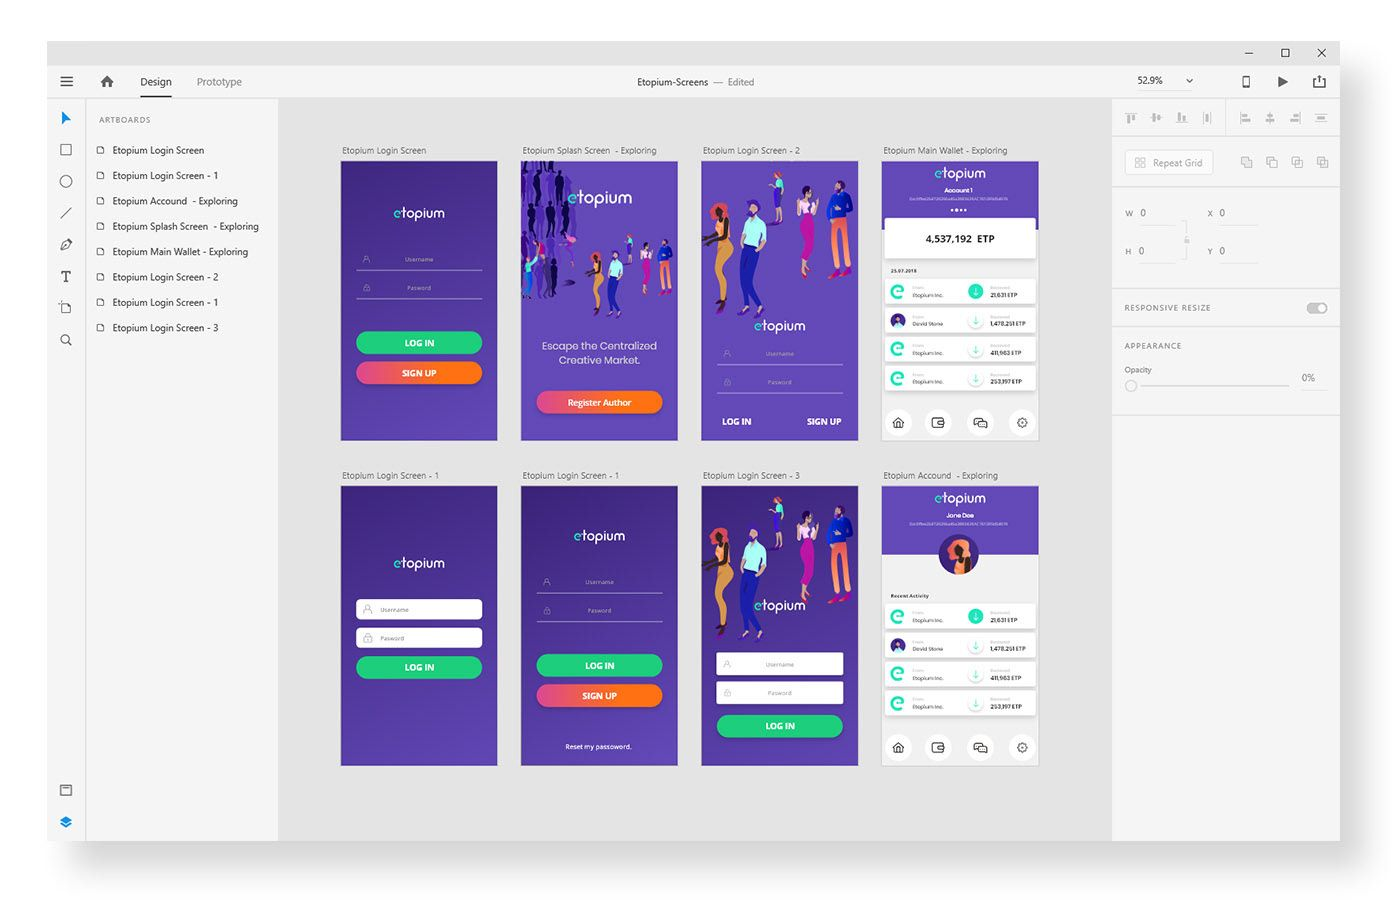 2019 Design Trends Guide On Behance Design Trends Web Design Trends Top Design Trends